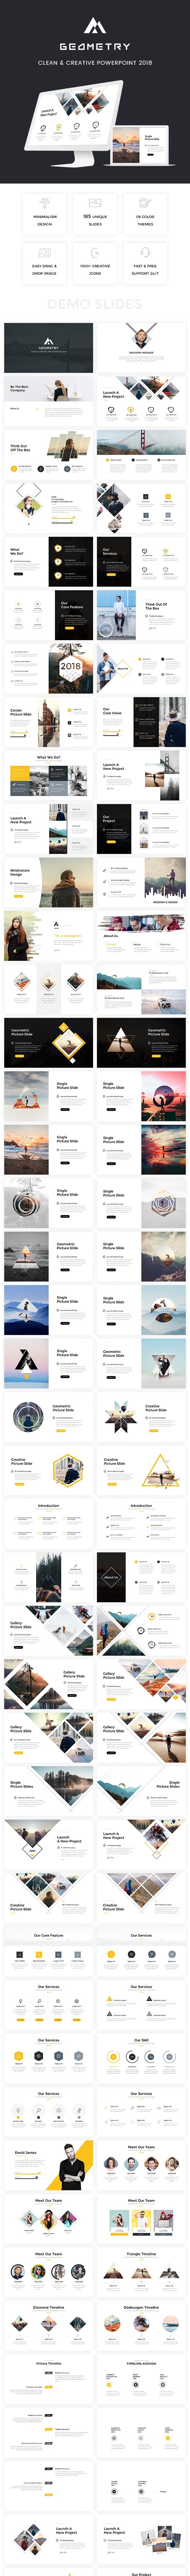 Geometry - Clean & Creative Powerpoint Template - Creative PowerPoint Templates